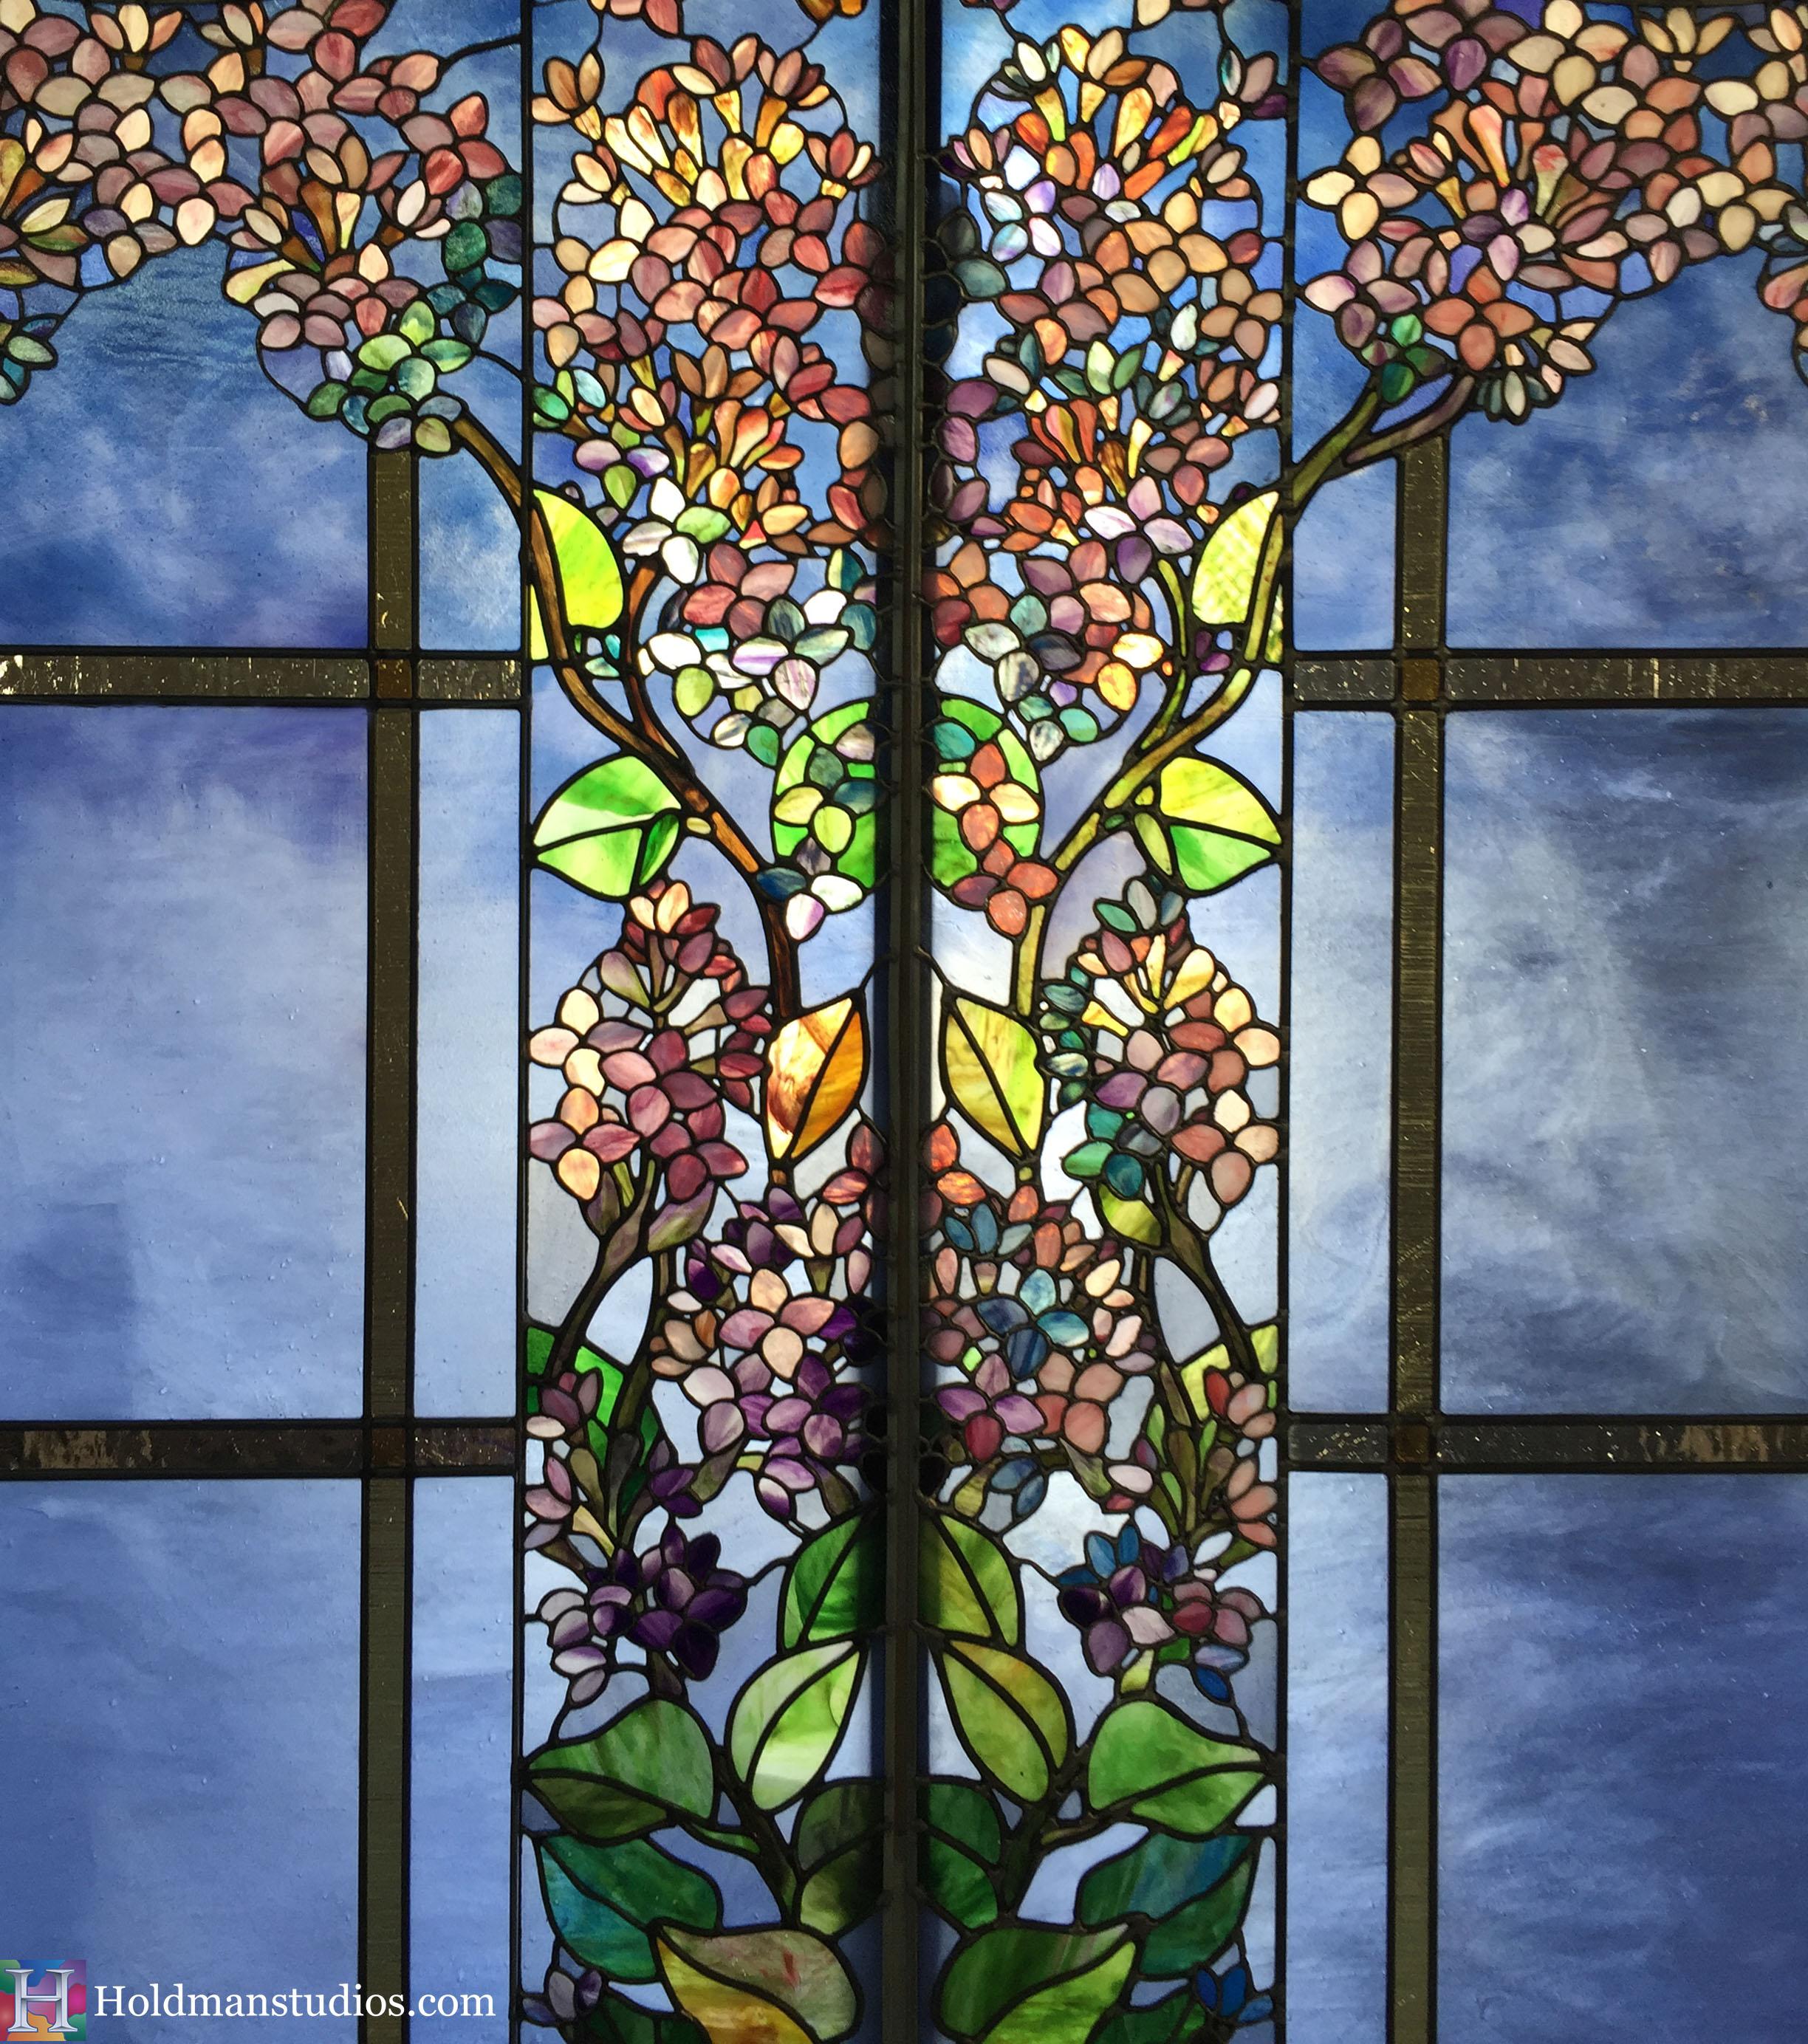 Holdman-Studios-Stained-Glass-Paris-LDS-Temple-Lilac-Flowers-Leaves-Sky-Windows.jpg